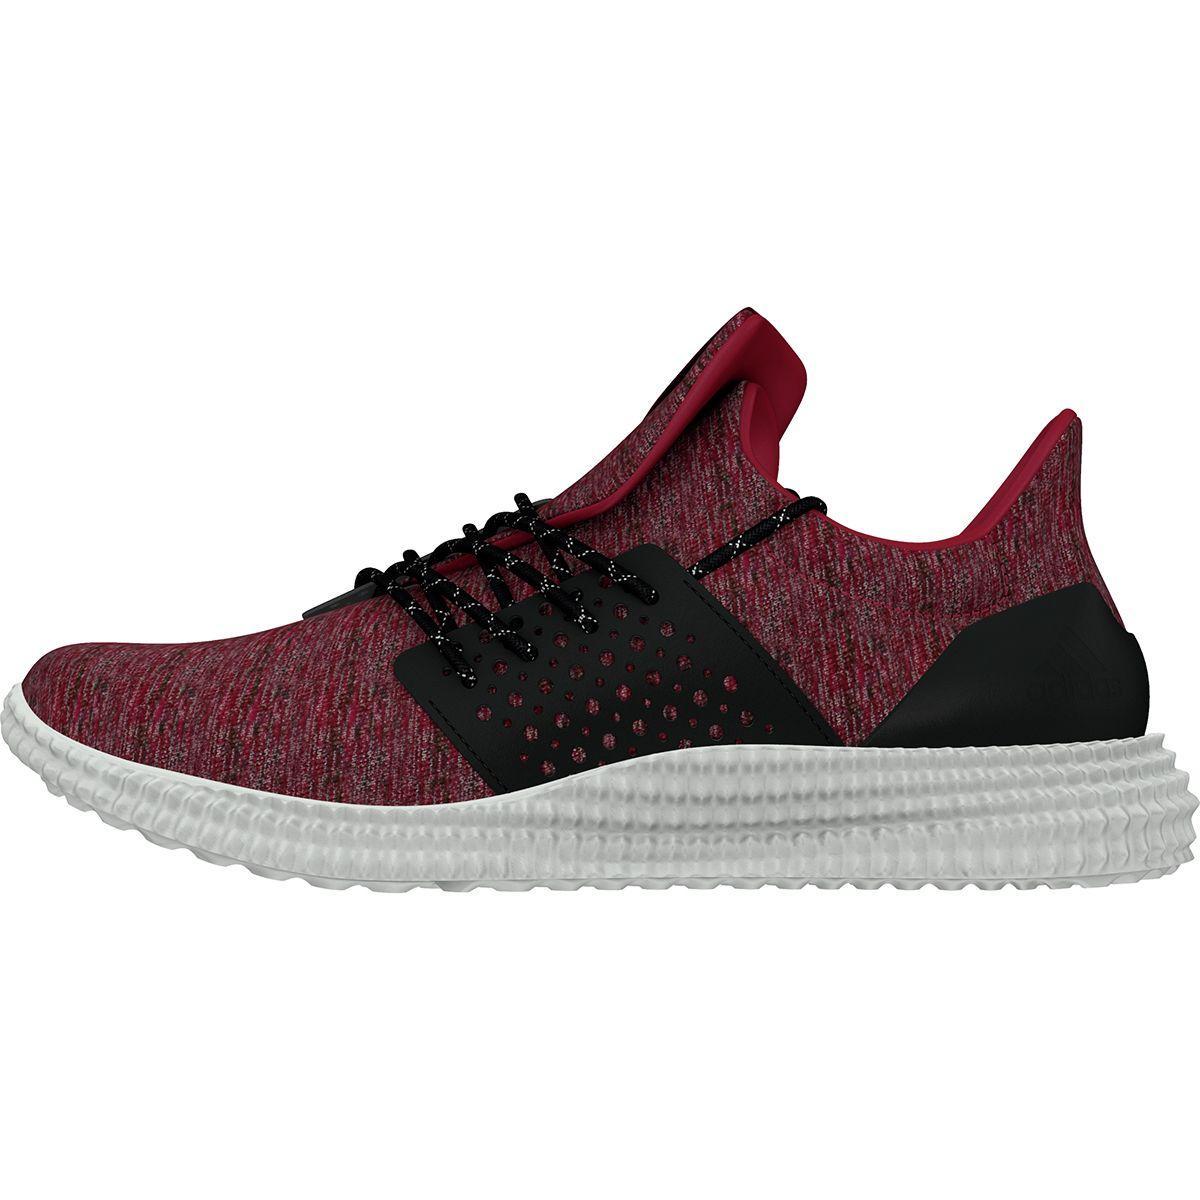 huge discount af8c5 b9c87 Adidas - Multicolor Athletics 247 Cross Trainer Shoe - Lyst. View  fullscreen